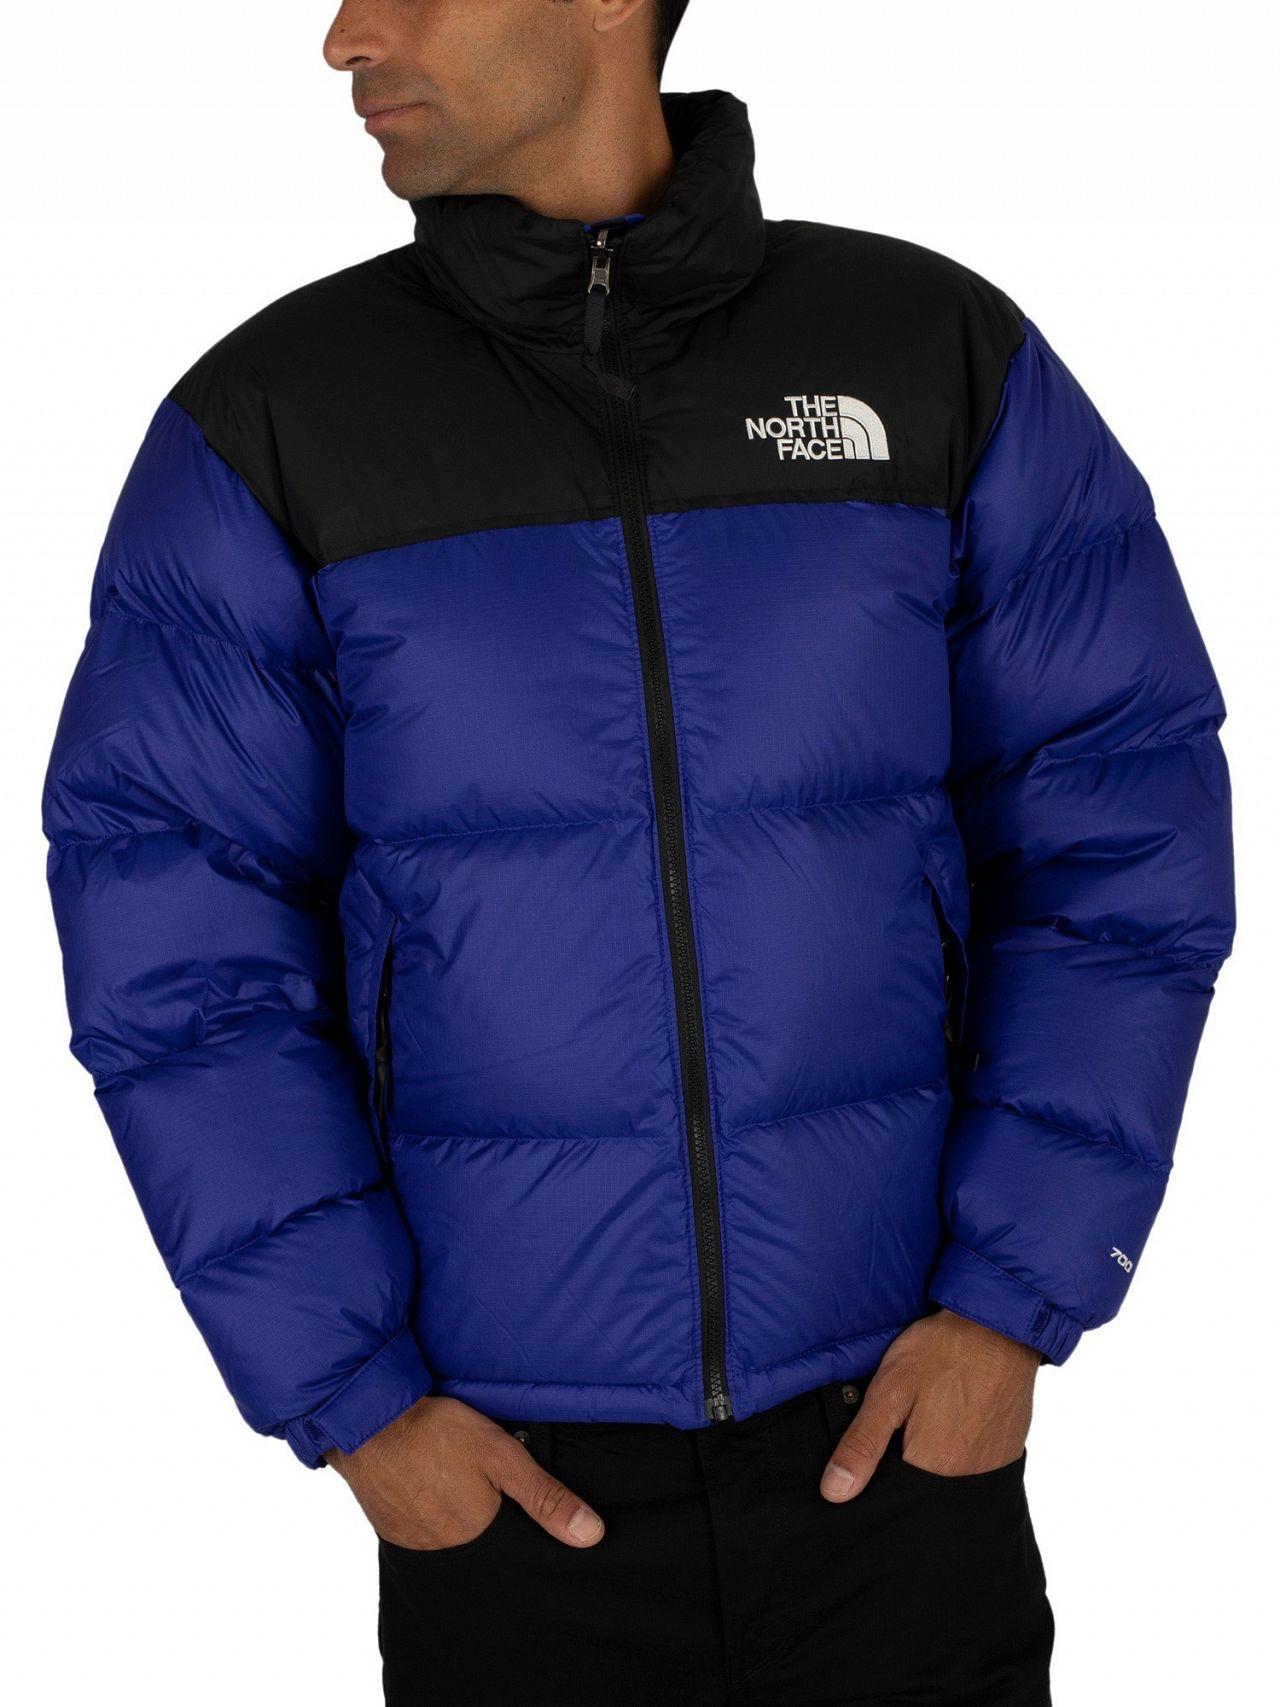 22b6e3abf The North Face Aztec Blue 1996 Retro Nuptse Jacket